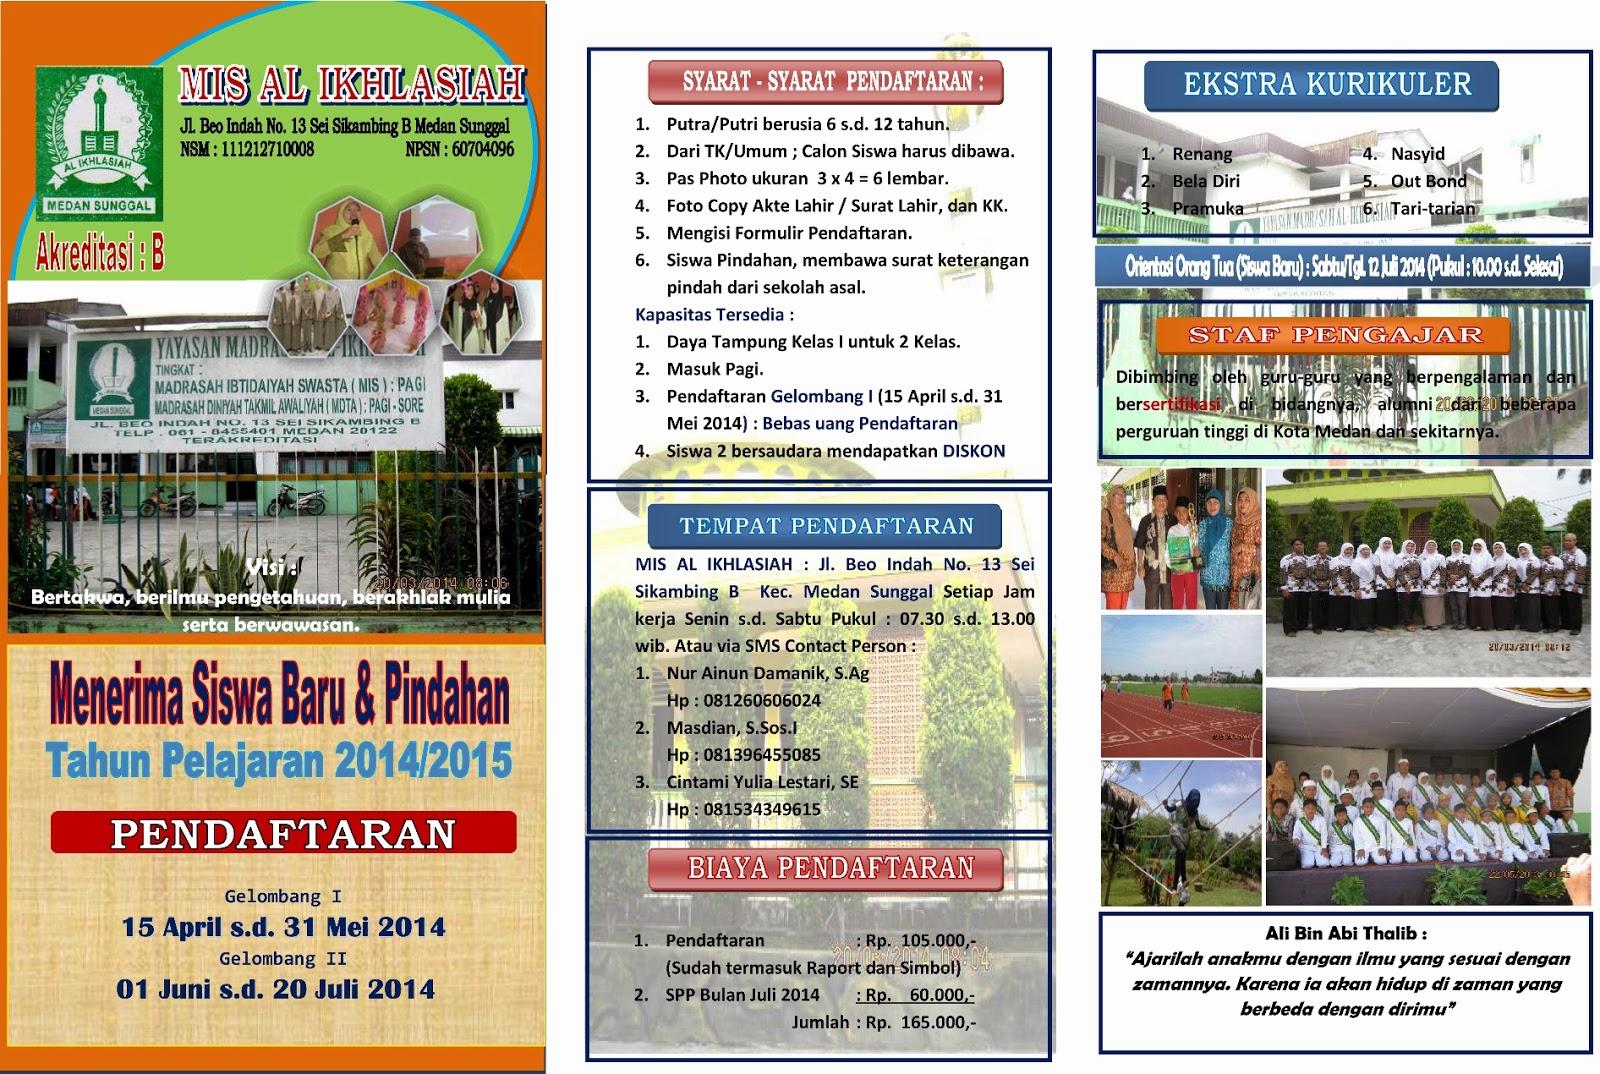 Mi Swasta Al Ikhlasiah Contoh Brosur Ppdb Tp 2011 S D 2014